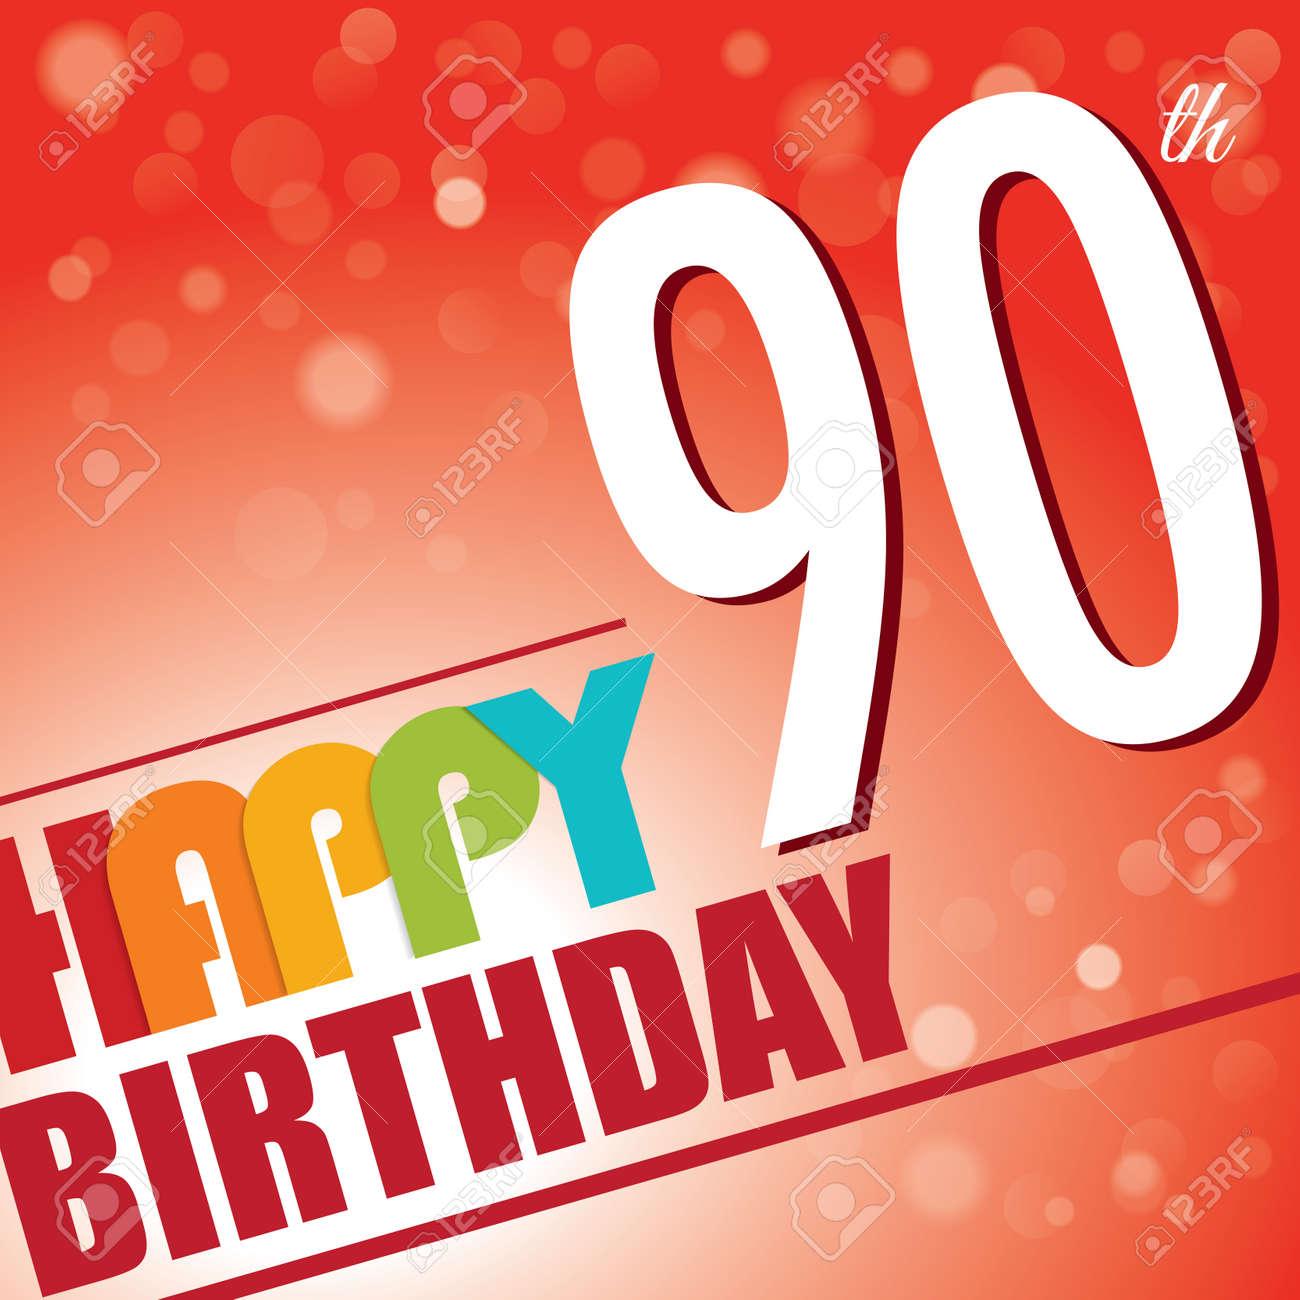 90th Birthday Party Invite Template Design In Bright And Colourful ...